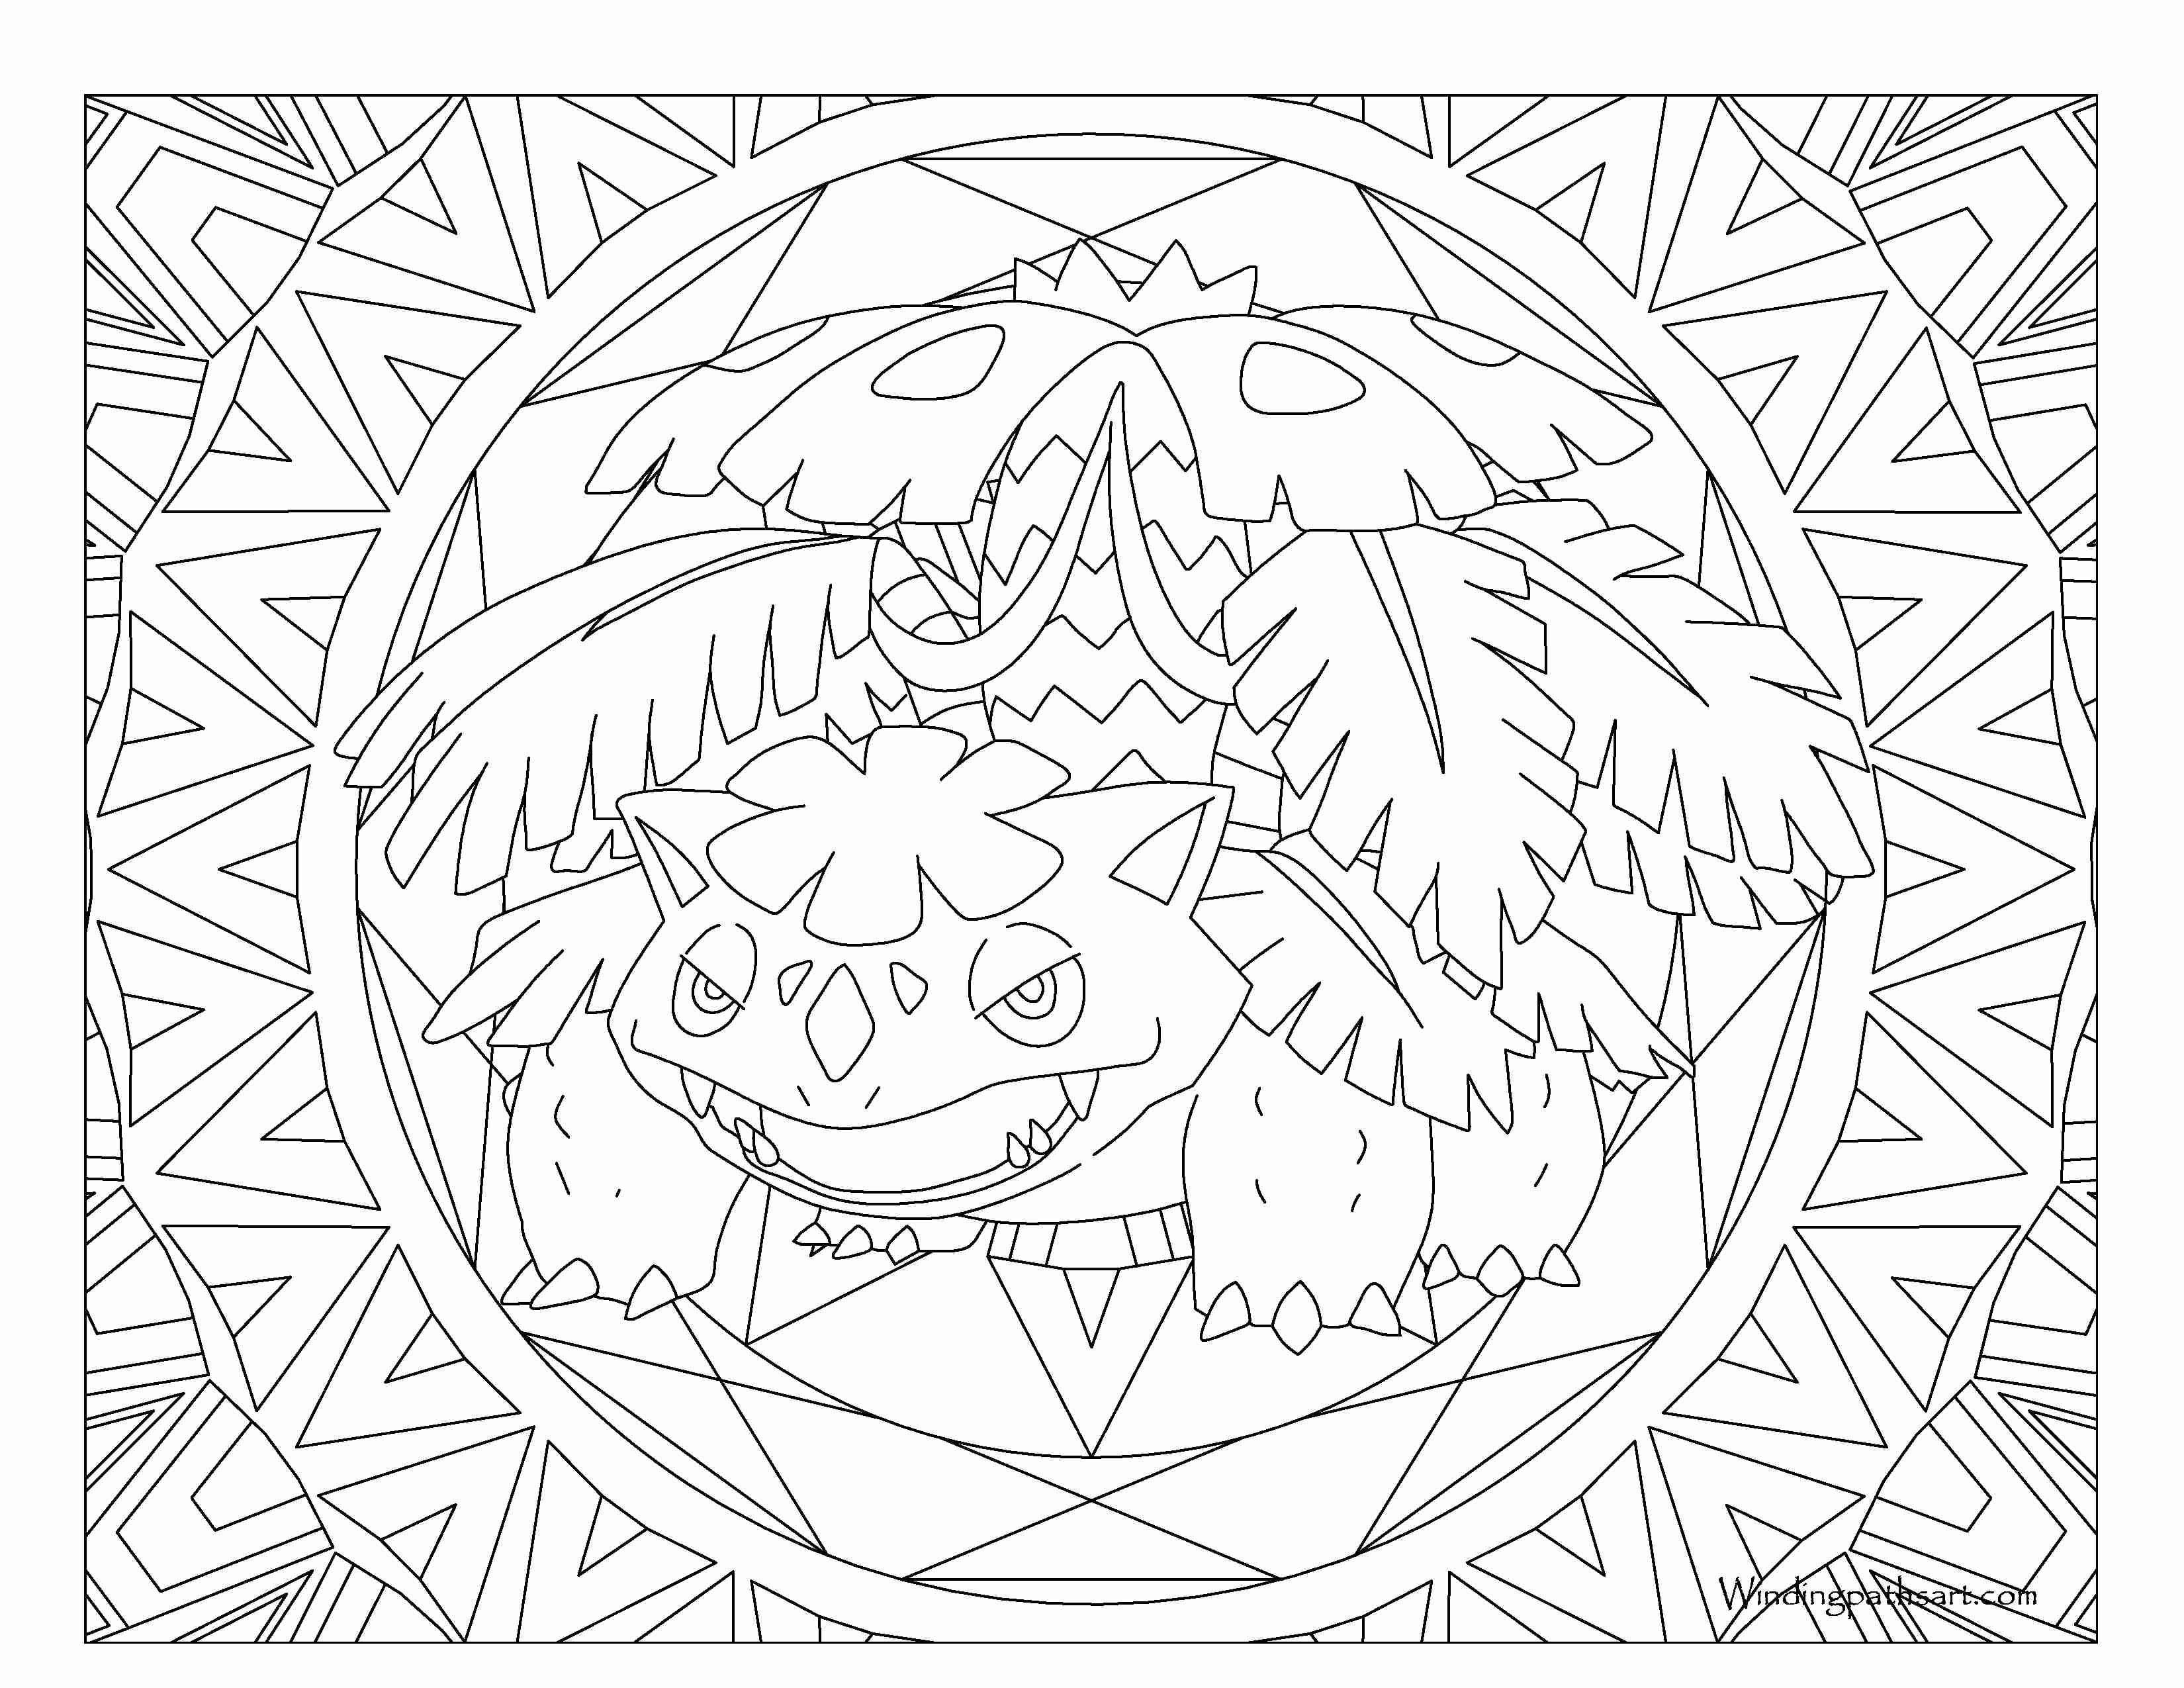 3300x2550 Venusaur Pokemon Coloring Page Windingpathsart Com Noticeable